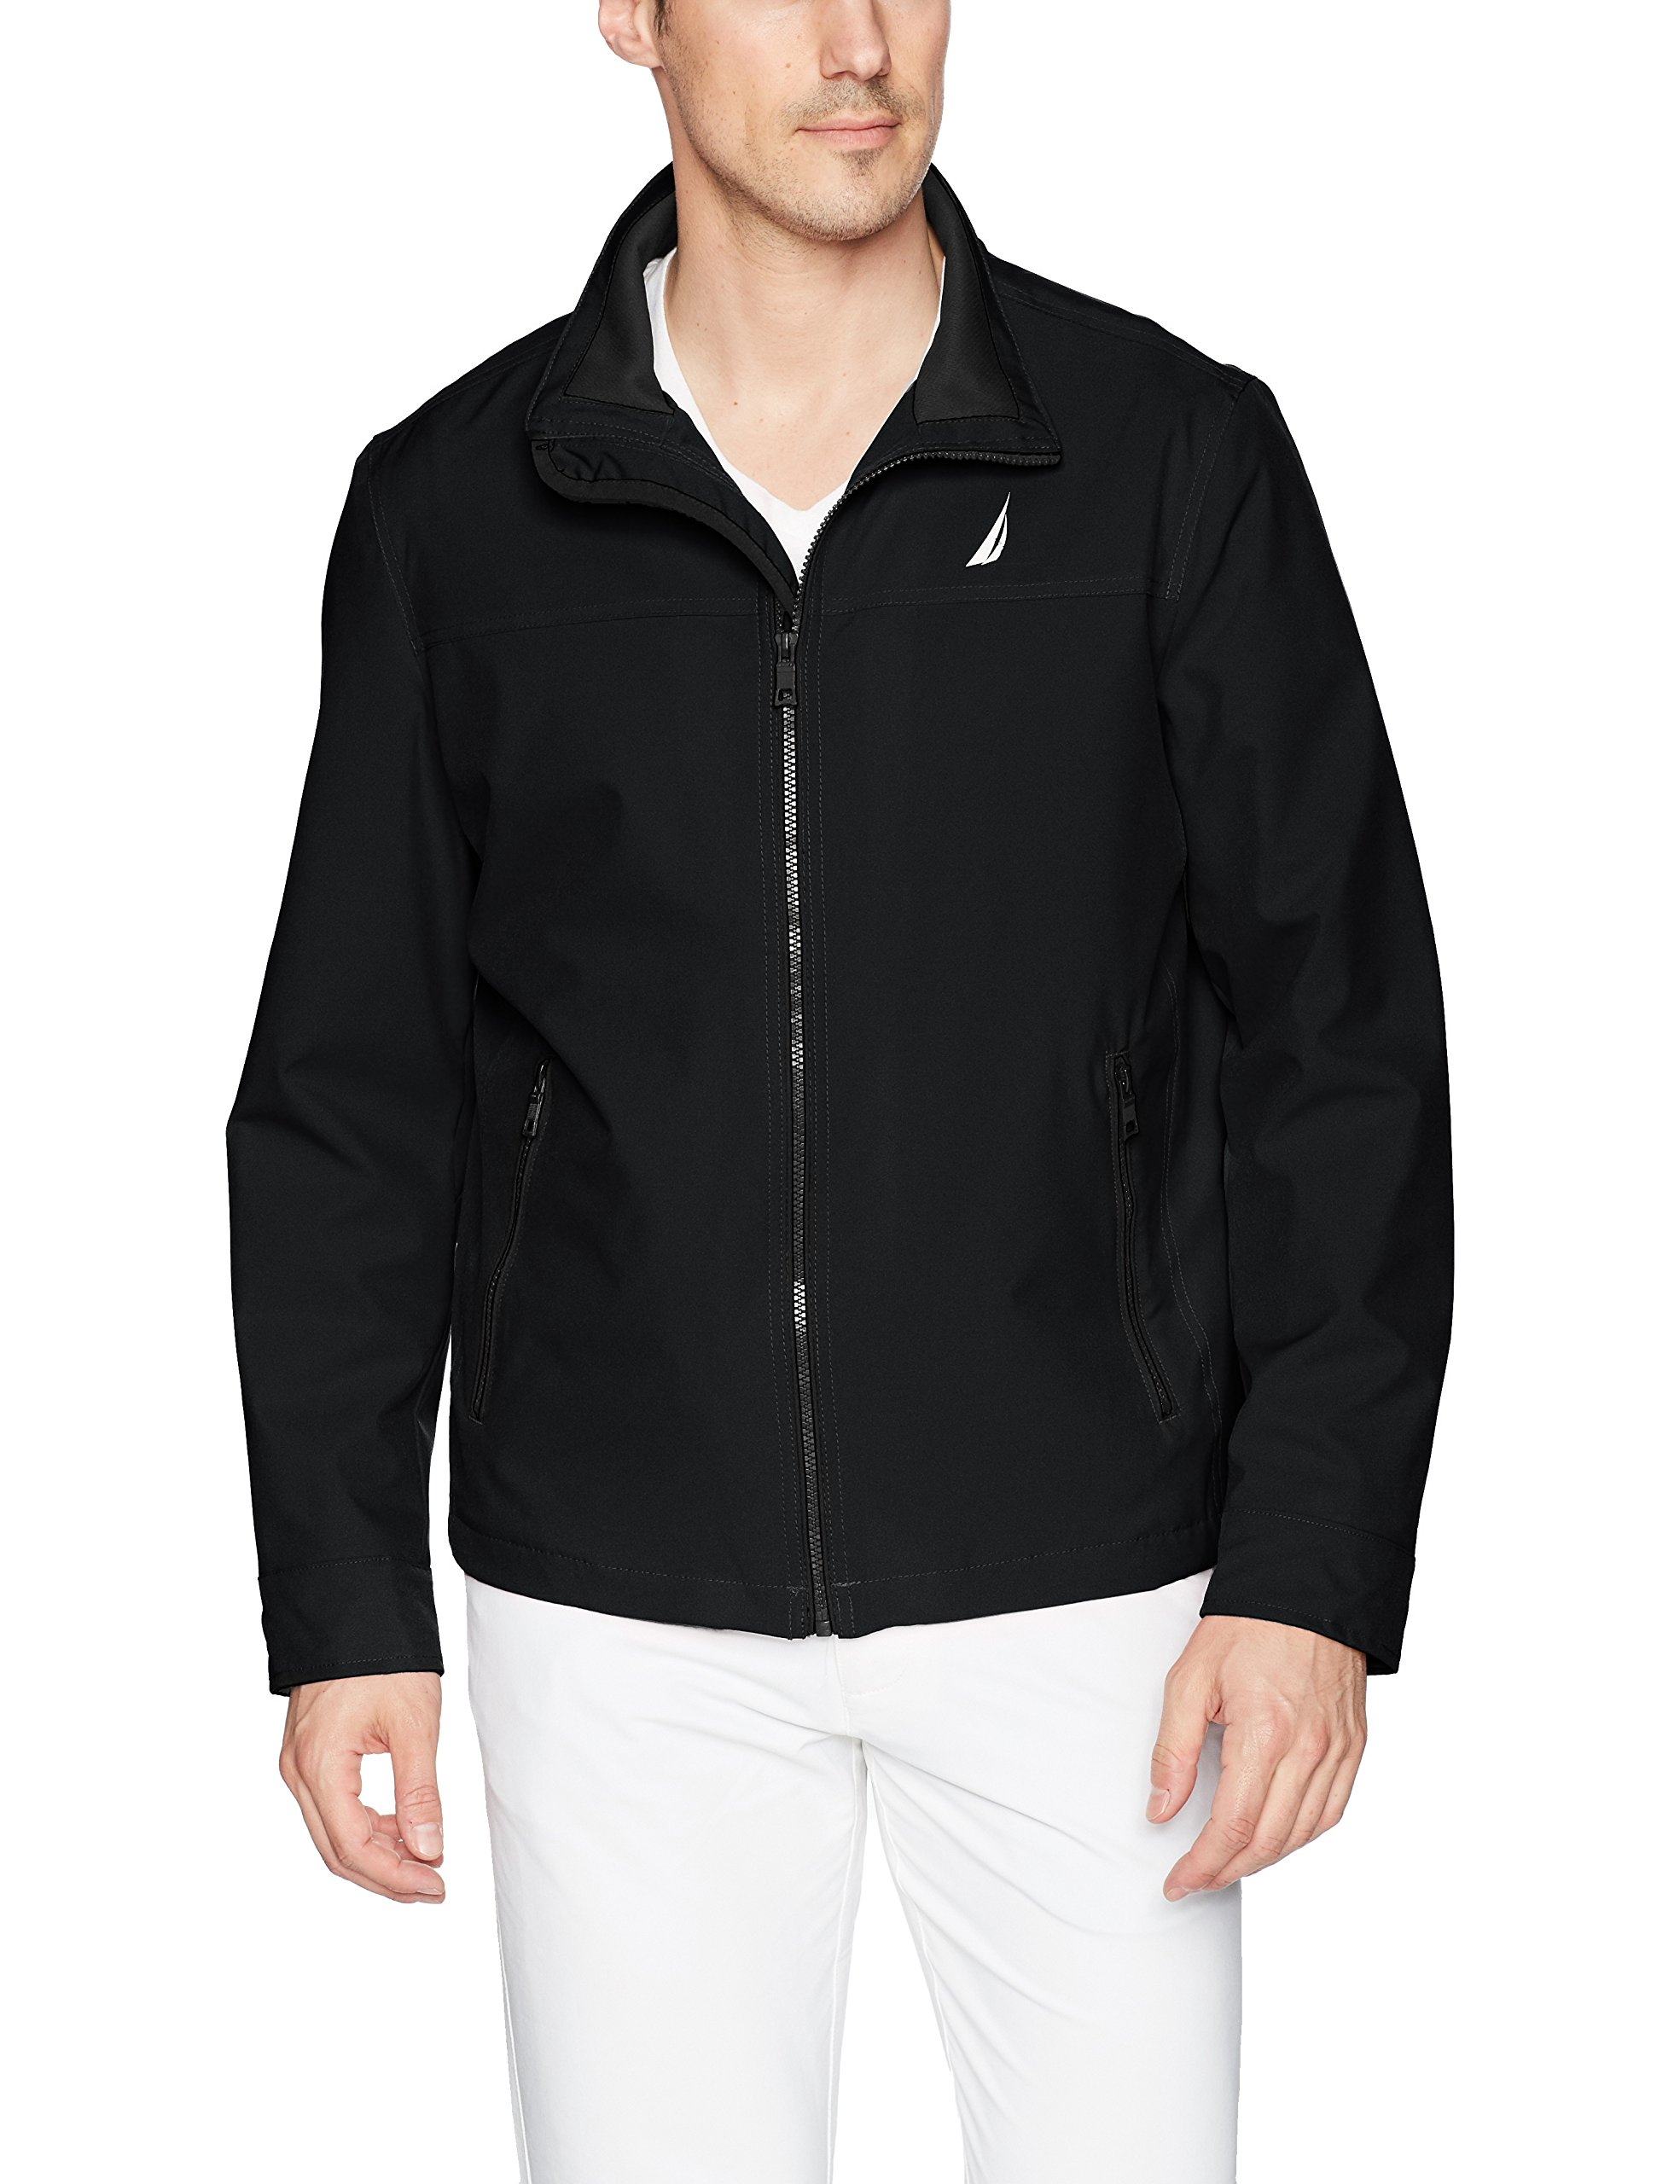 Nautica Men's Lightweight Stretch Golf Jacket, Deep Black, L